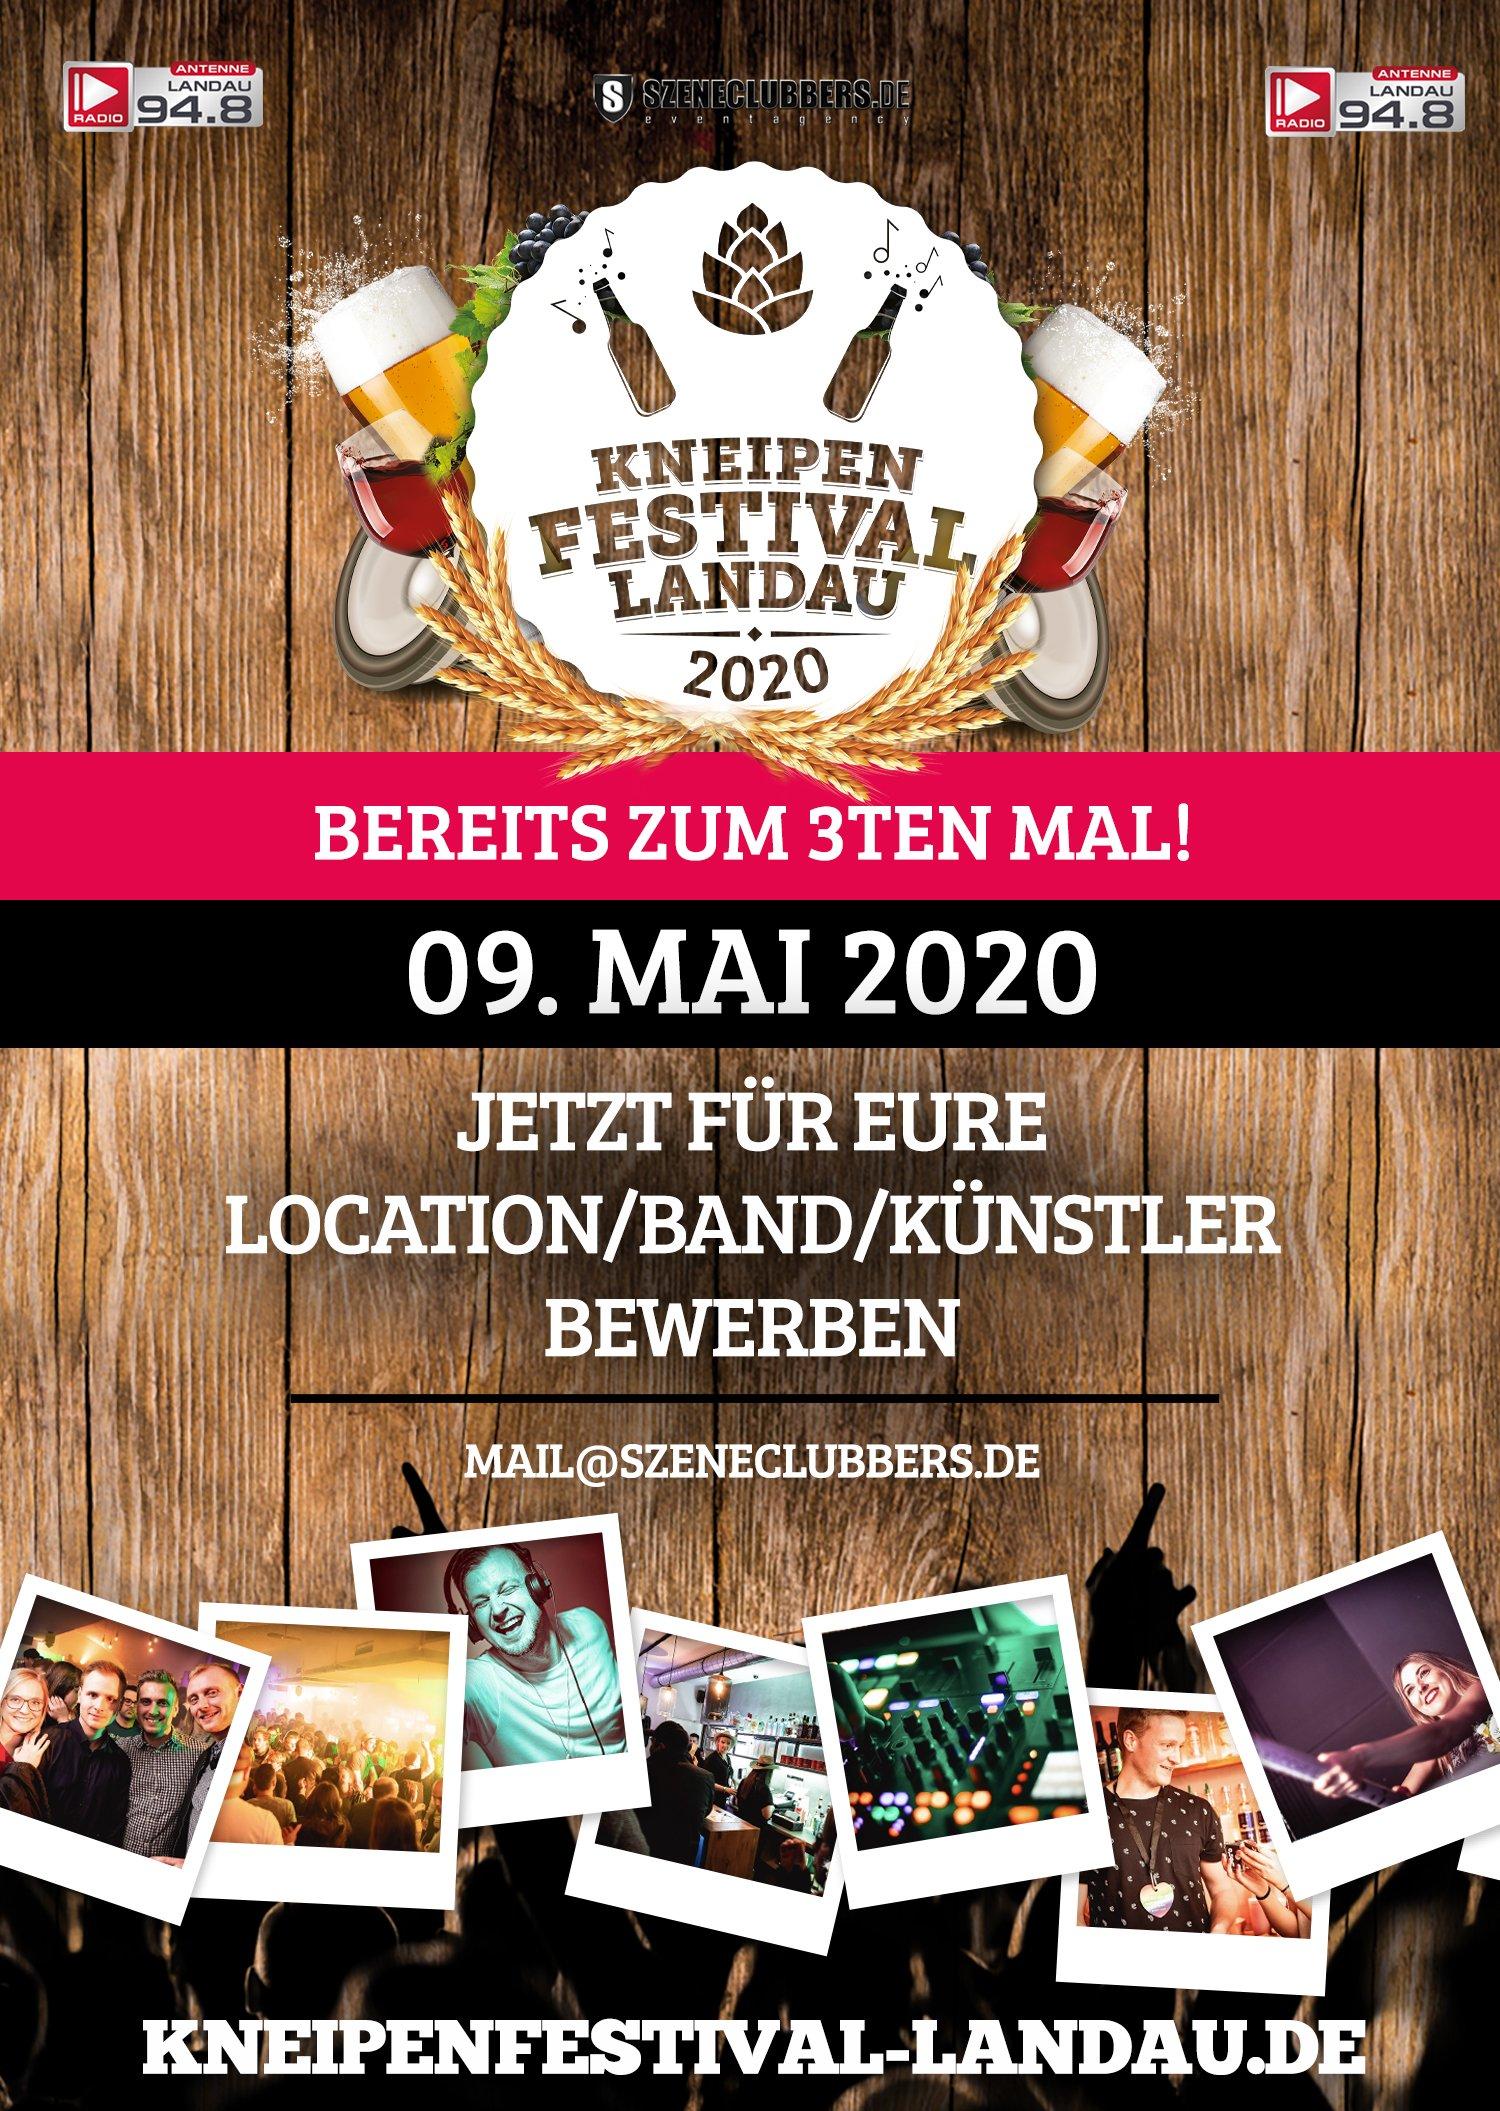 Kneipenfestival 2020